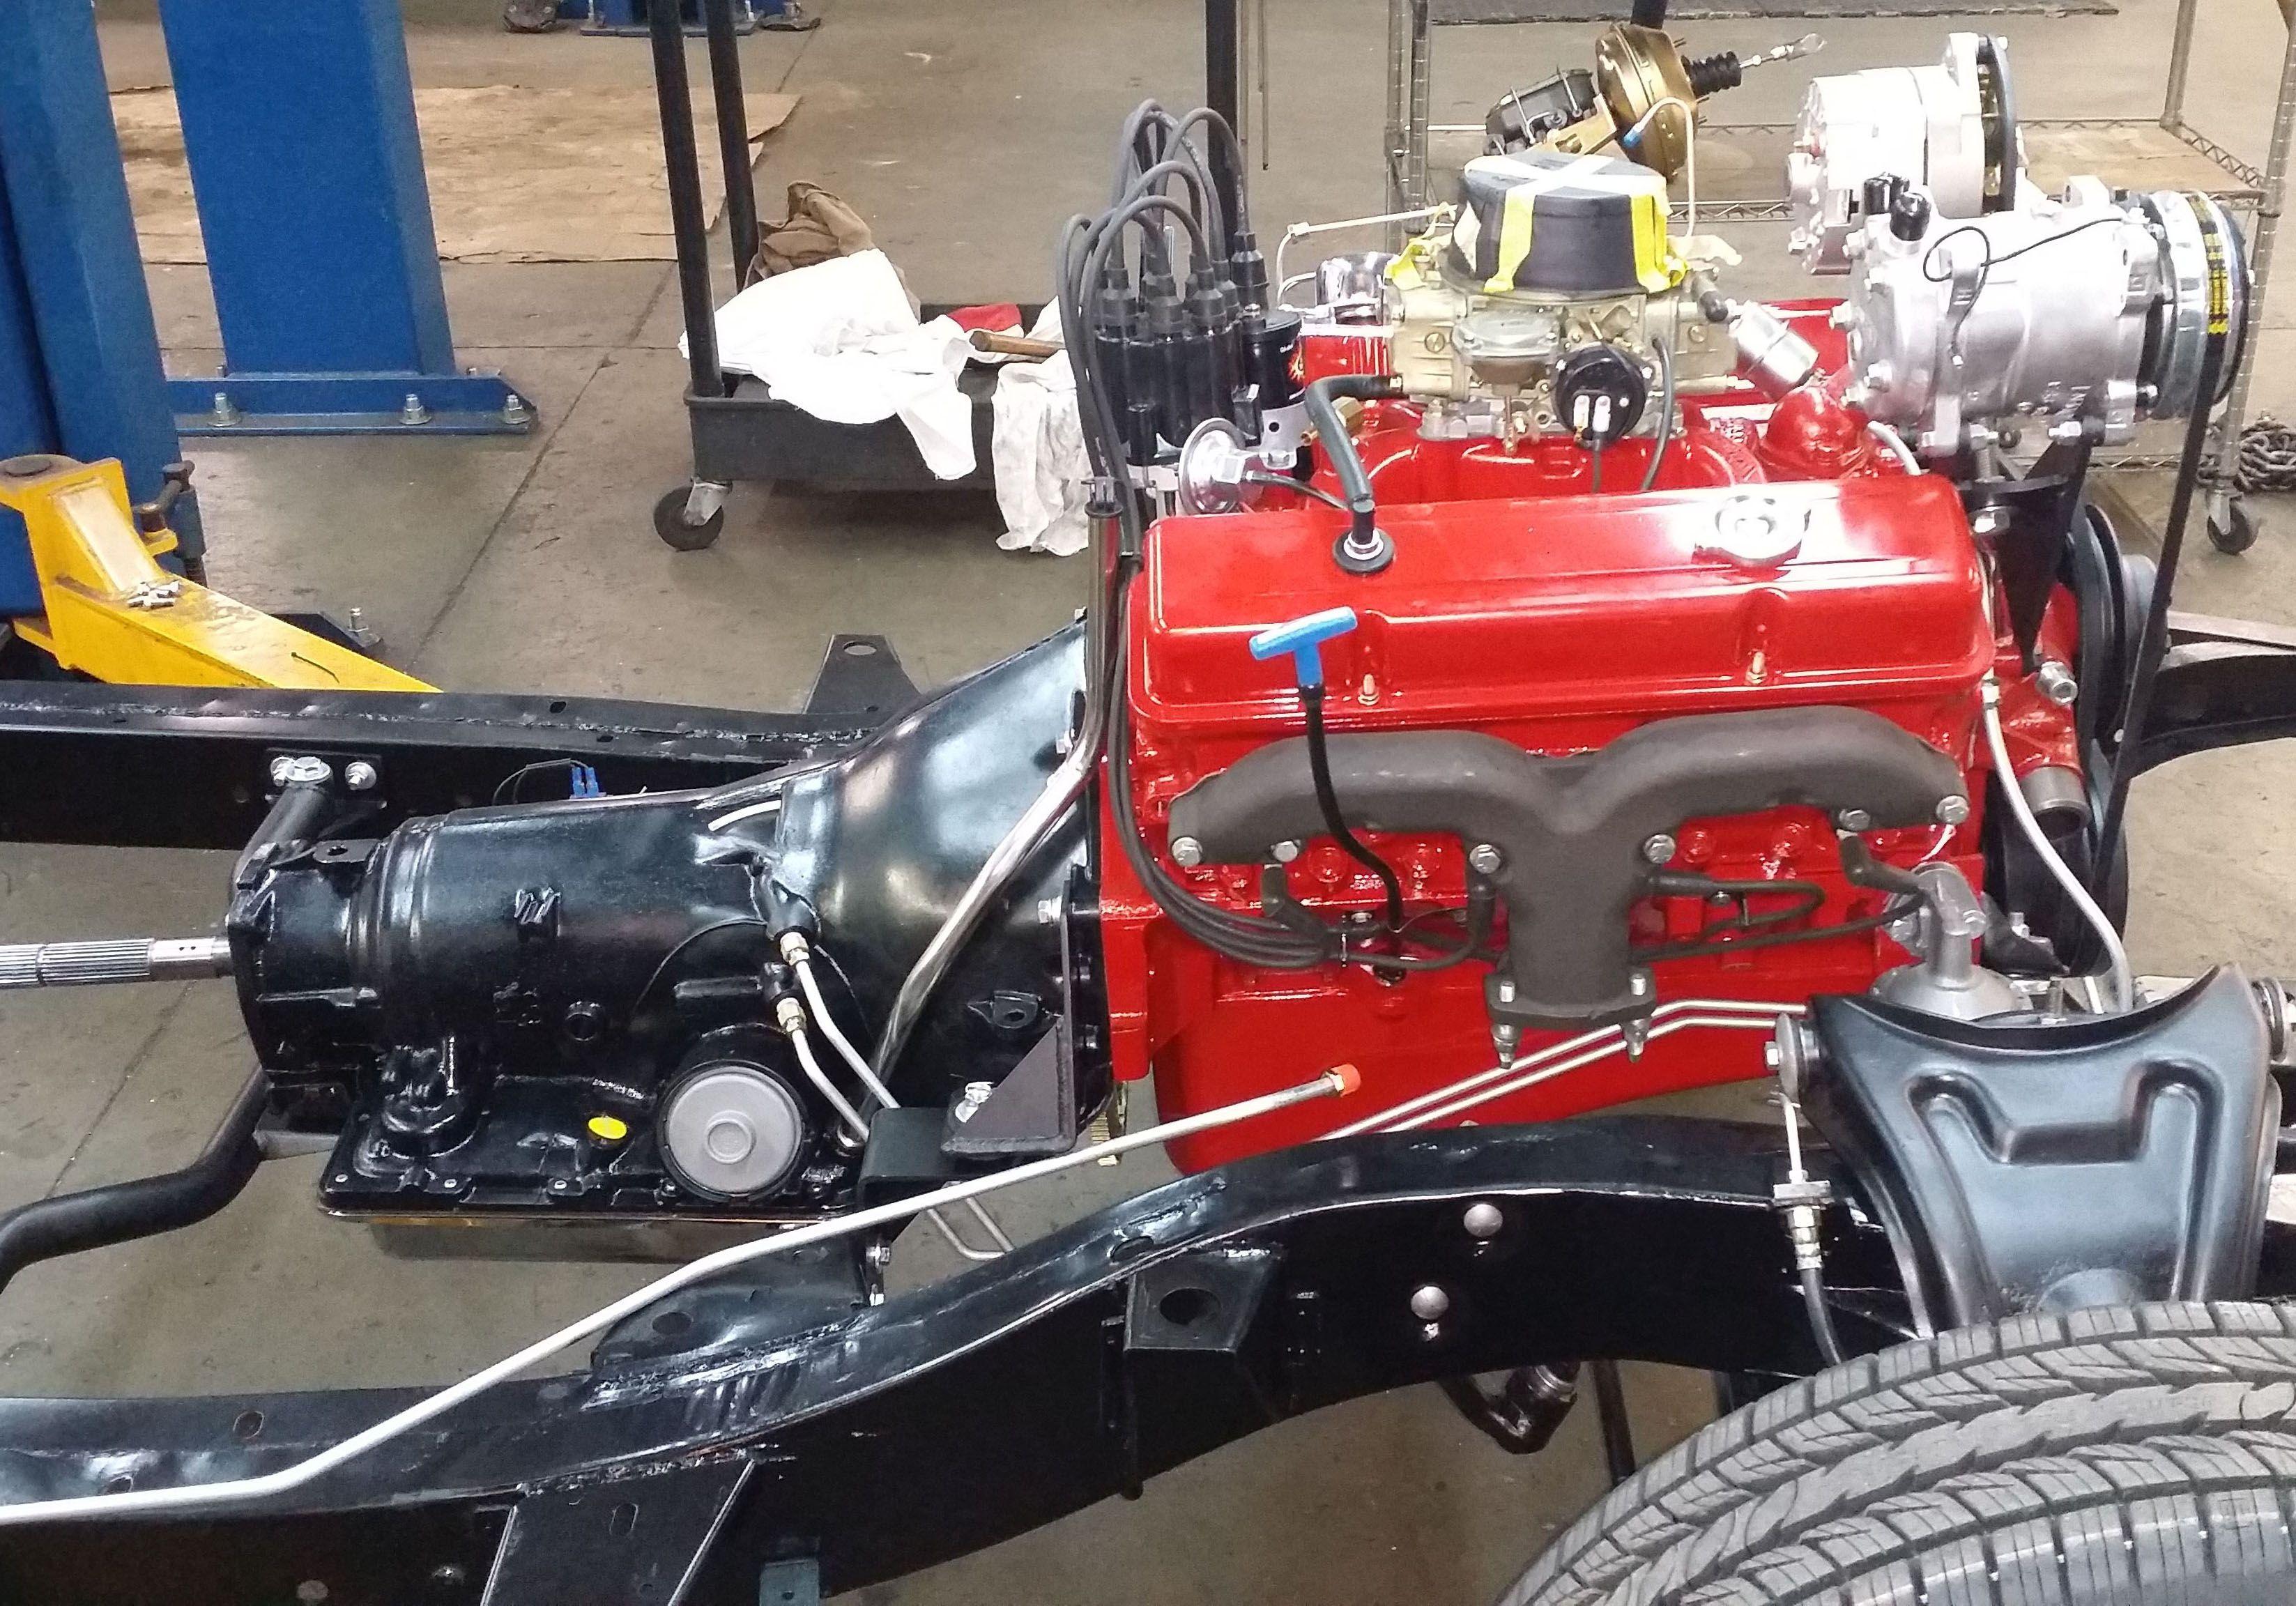 383ci stroker crate engine small block gm style longblock iron blueprint engines customer stan gilbreath installed a bp3832ct1 in his 1956 bel air blueprintengines bp3832ct1 frameoffrestoration belair malvernweather Images